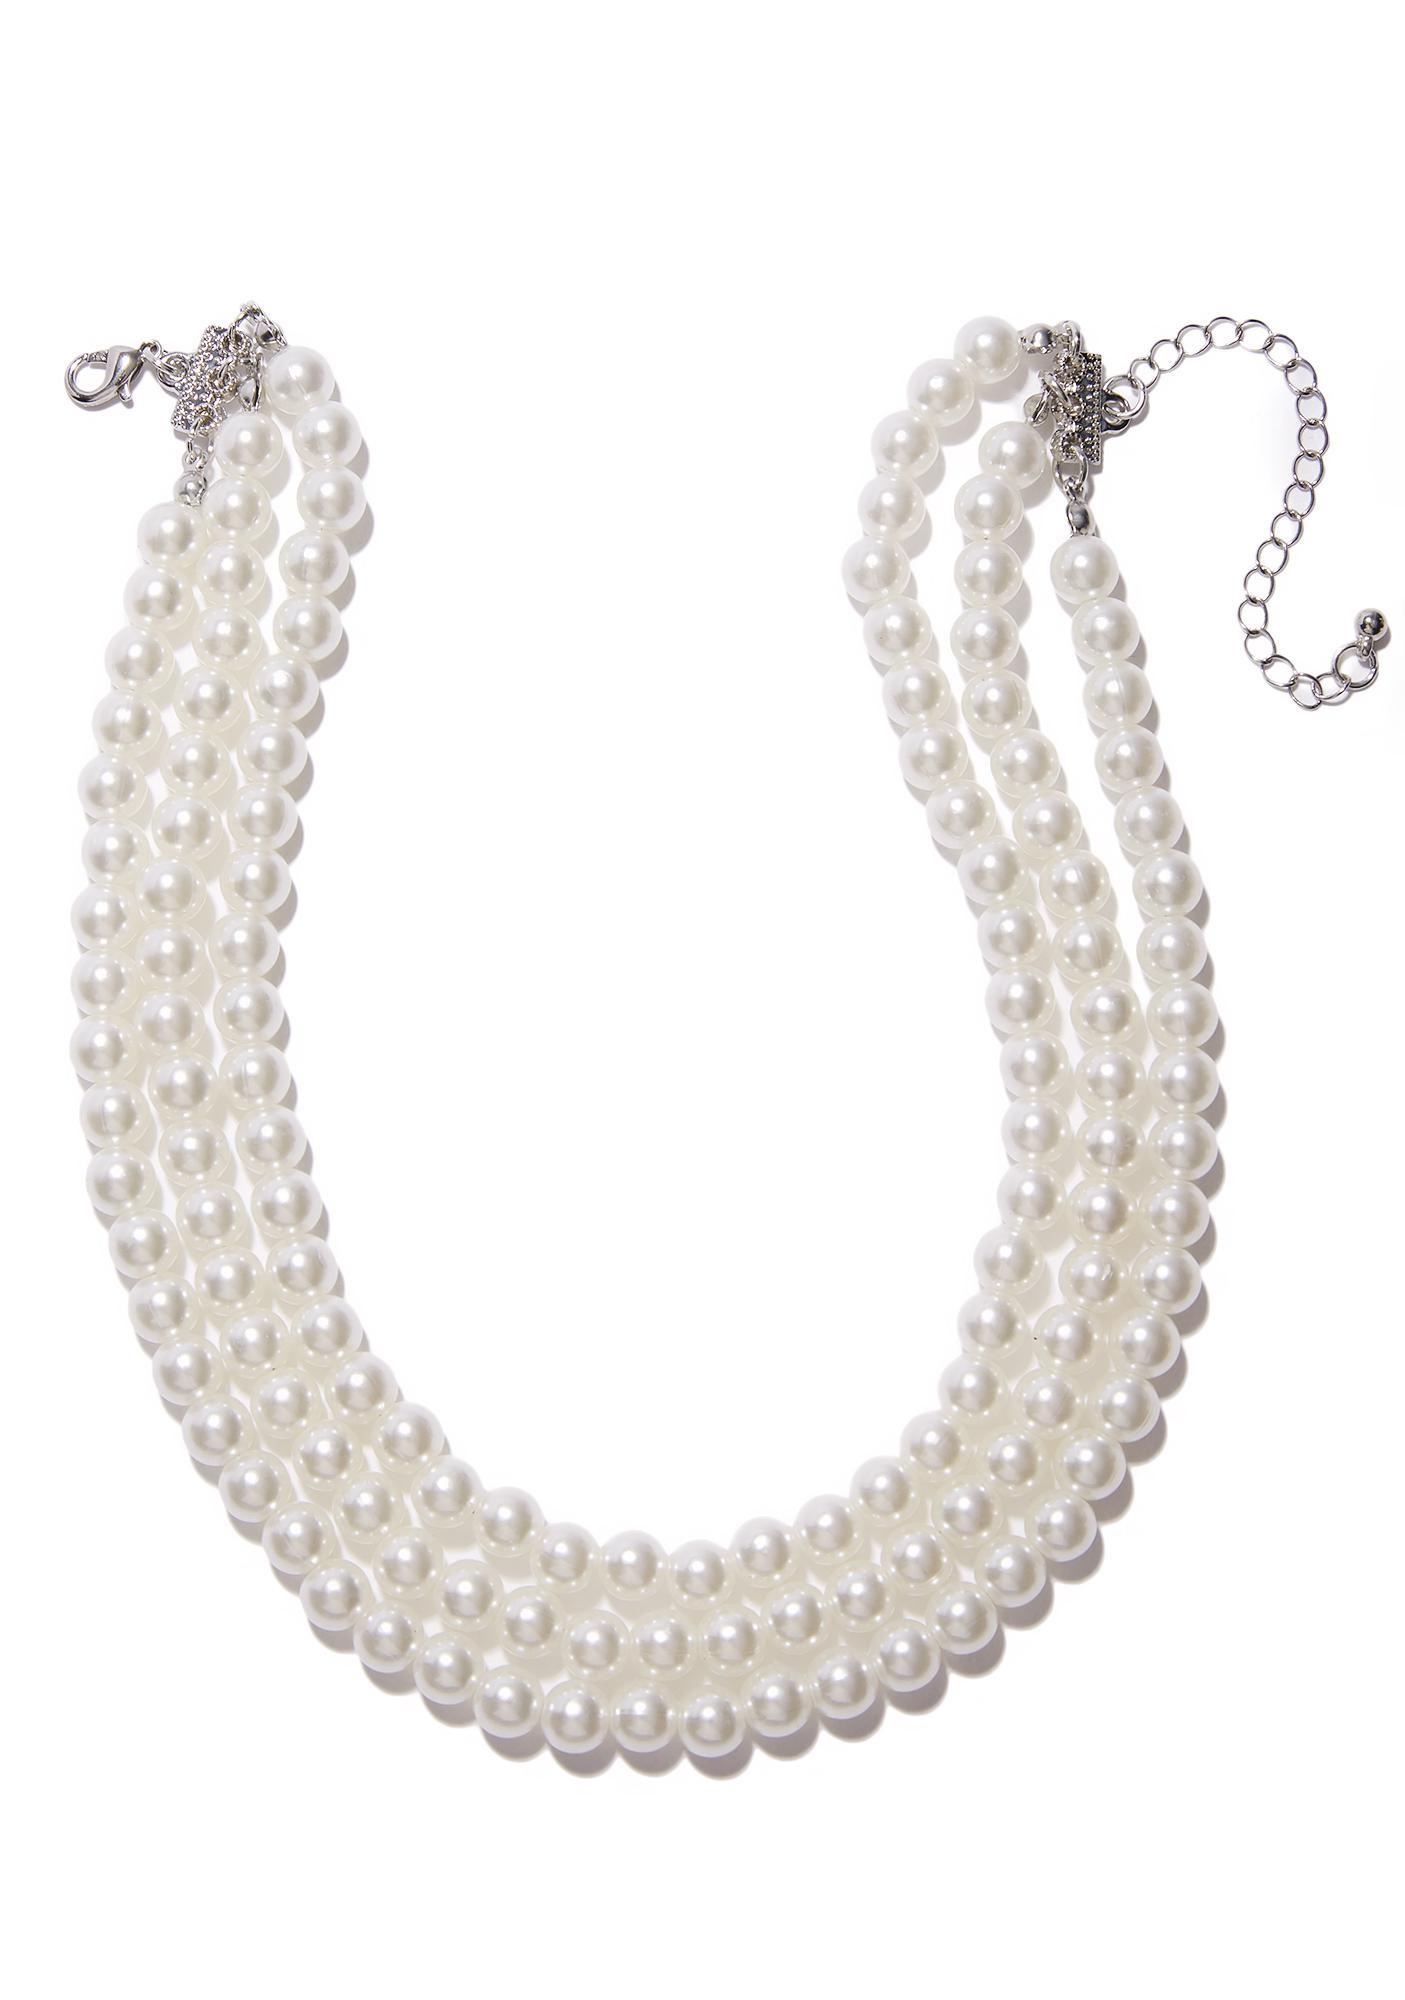 Clutching My Pearls Choker